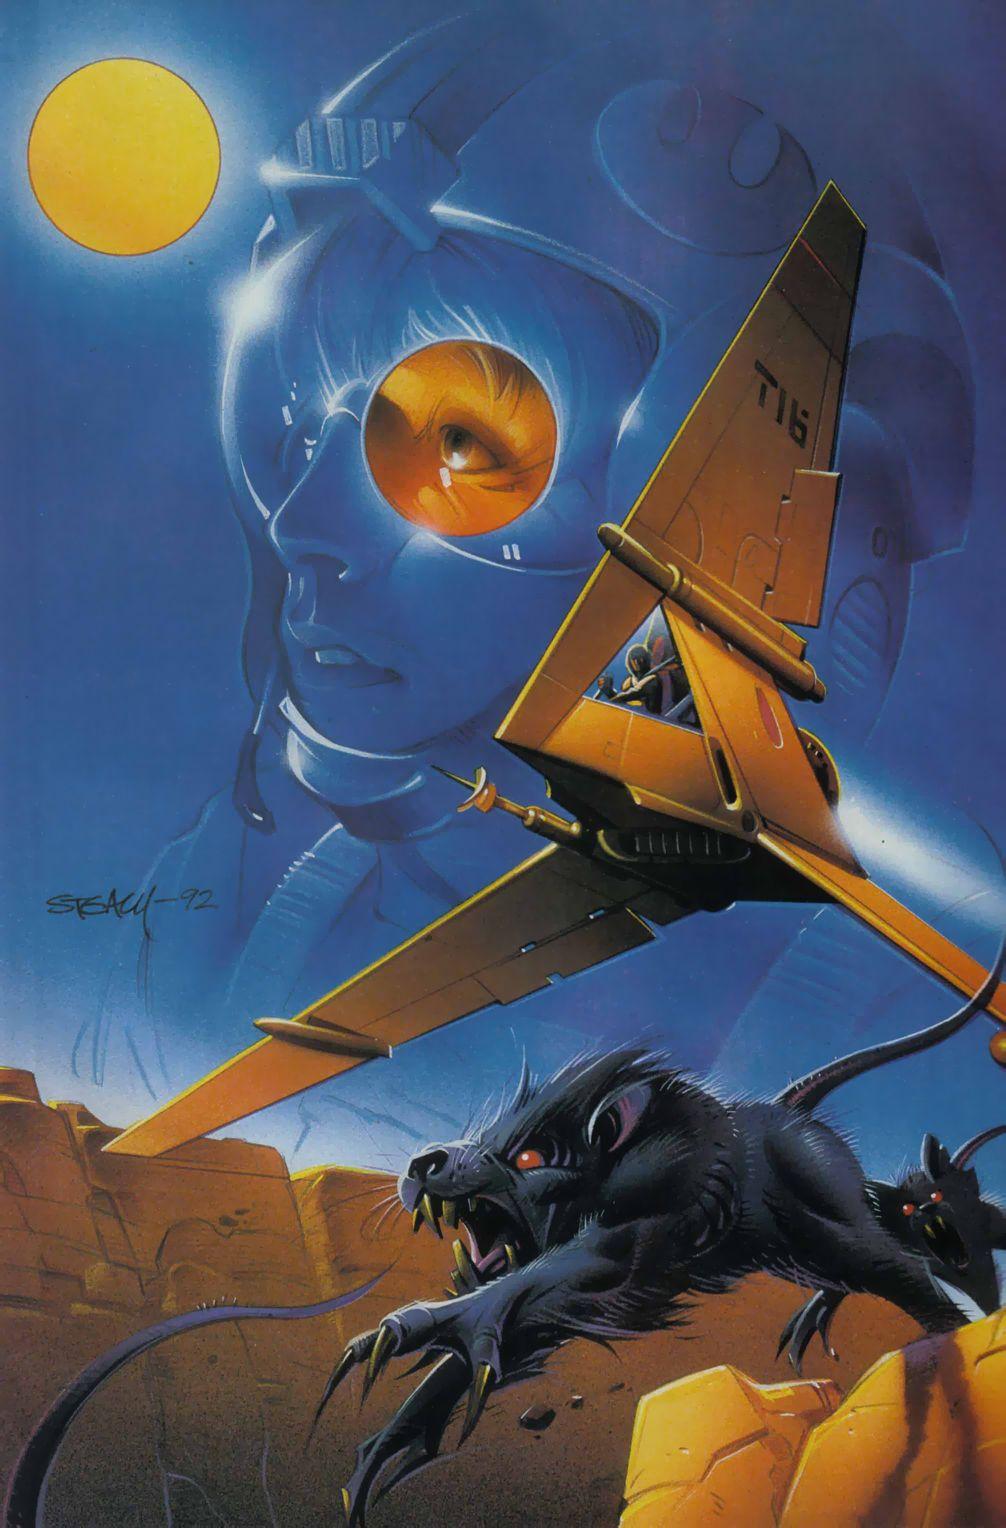 Bull S Eying A Womp Rat By Ken Steacy Star Wars Ships Star Wars Empire Star Wars Galaxies Hero is more like it. pinterest